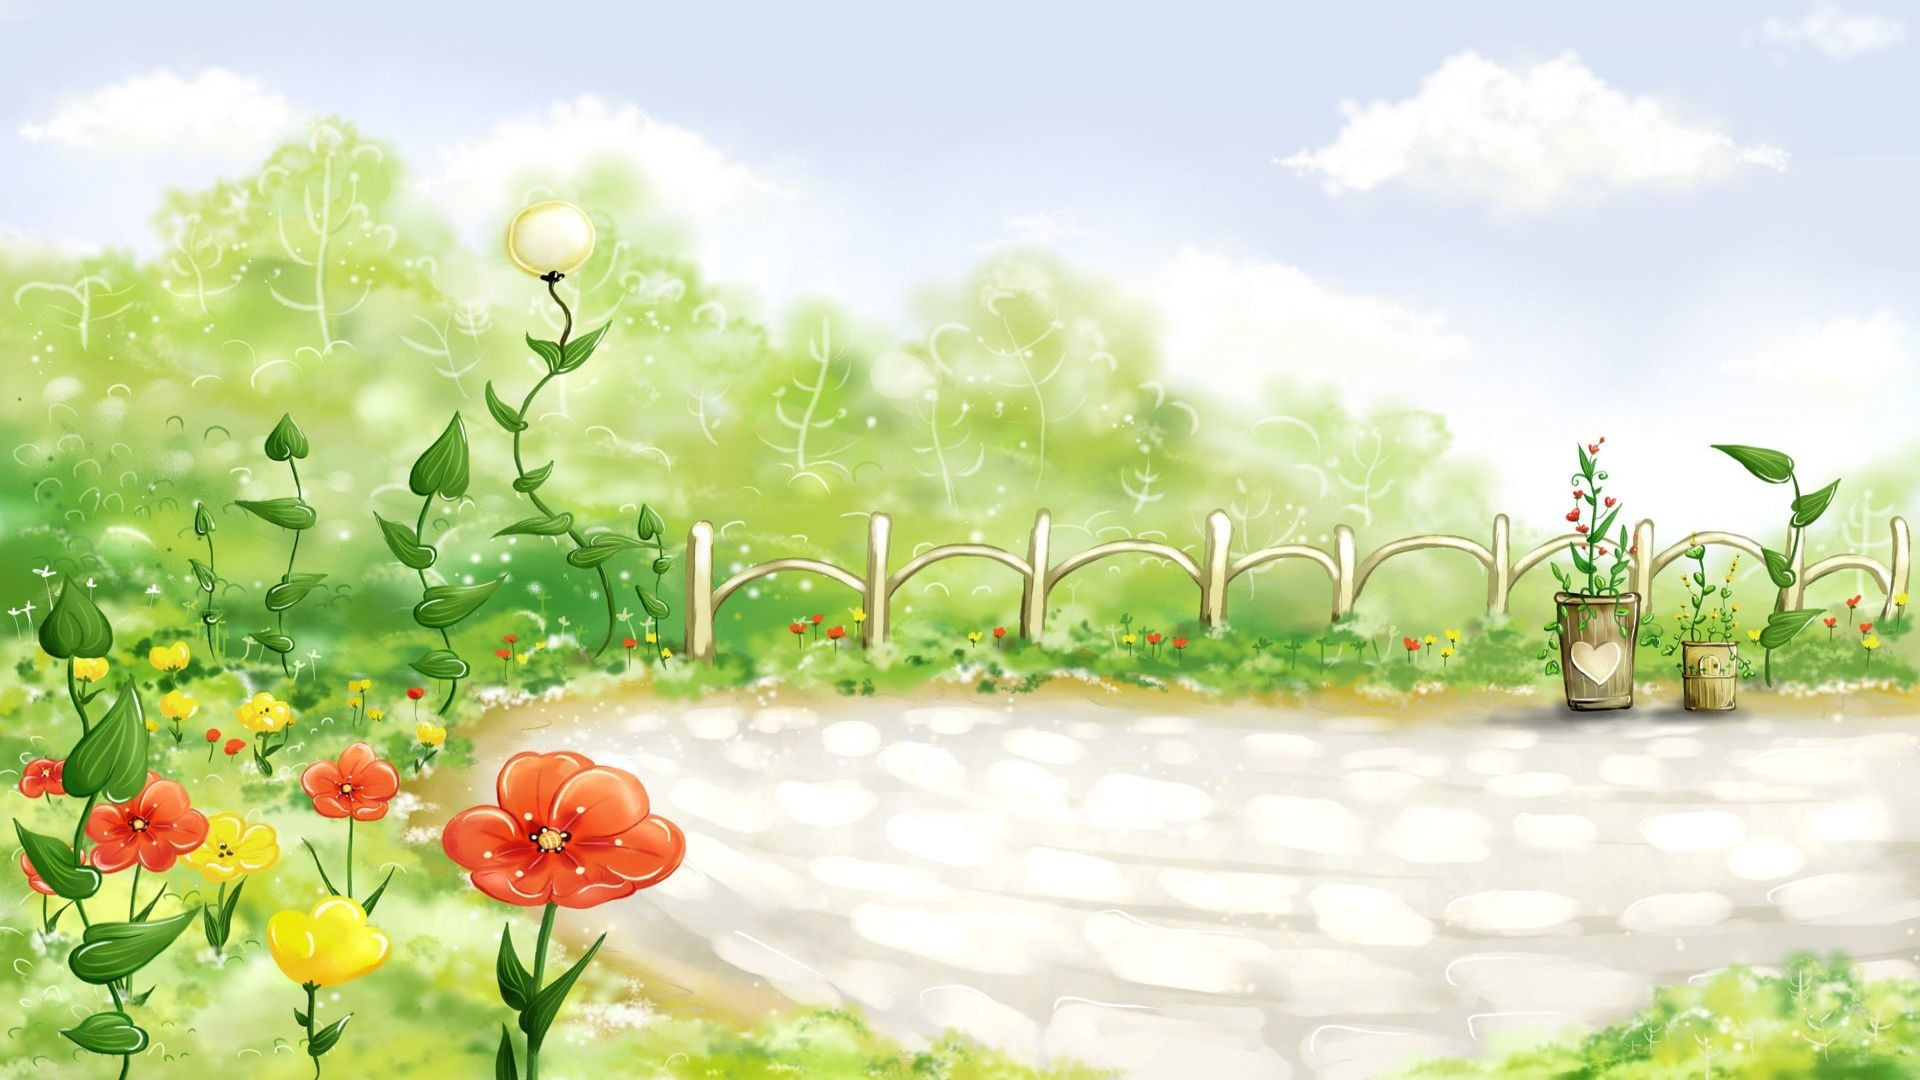 cartoon nature wallpaper – Cartoon Nature Landscape | Chinderland |  Pinterest | Nature wallpaper, Cartoon and Wallpaper